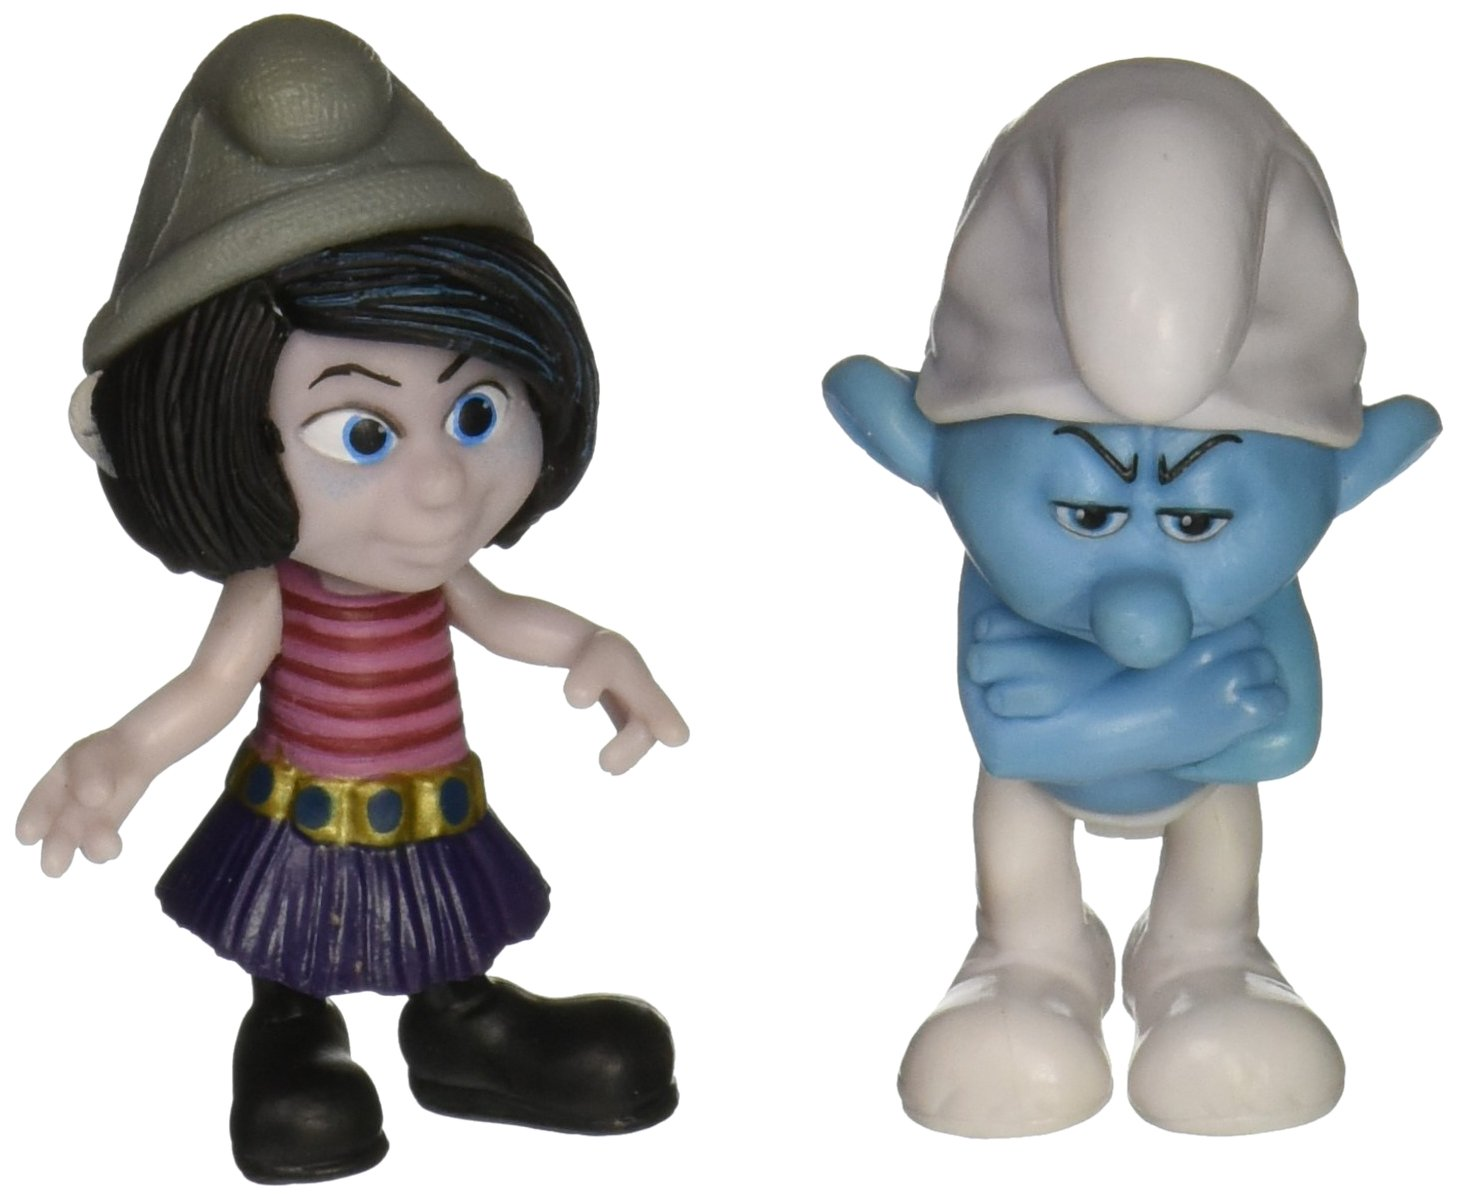 Smurfs Grab Em's Grouchy & Vexy Figure (2 Pack)